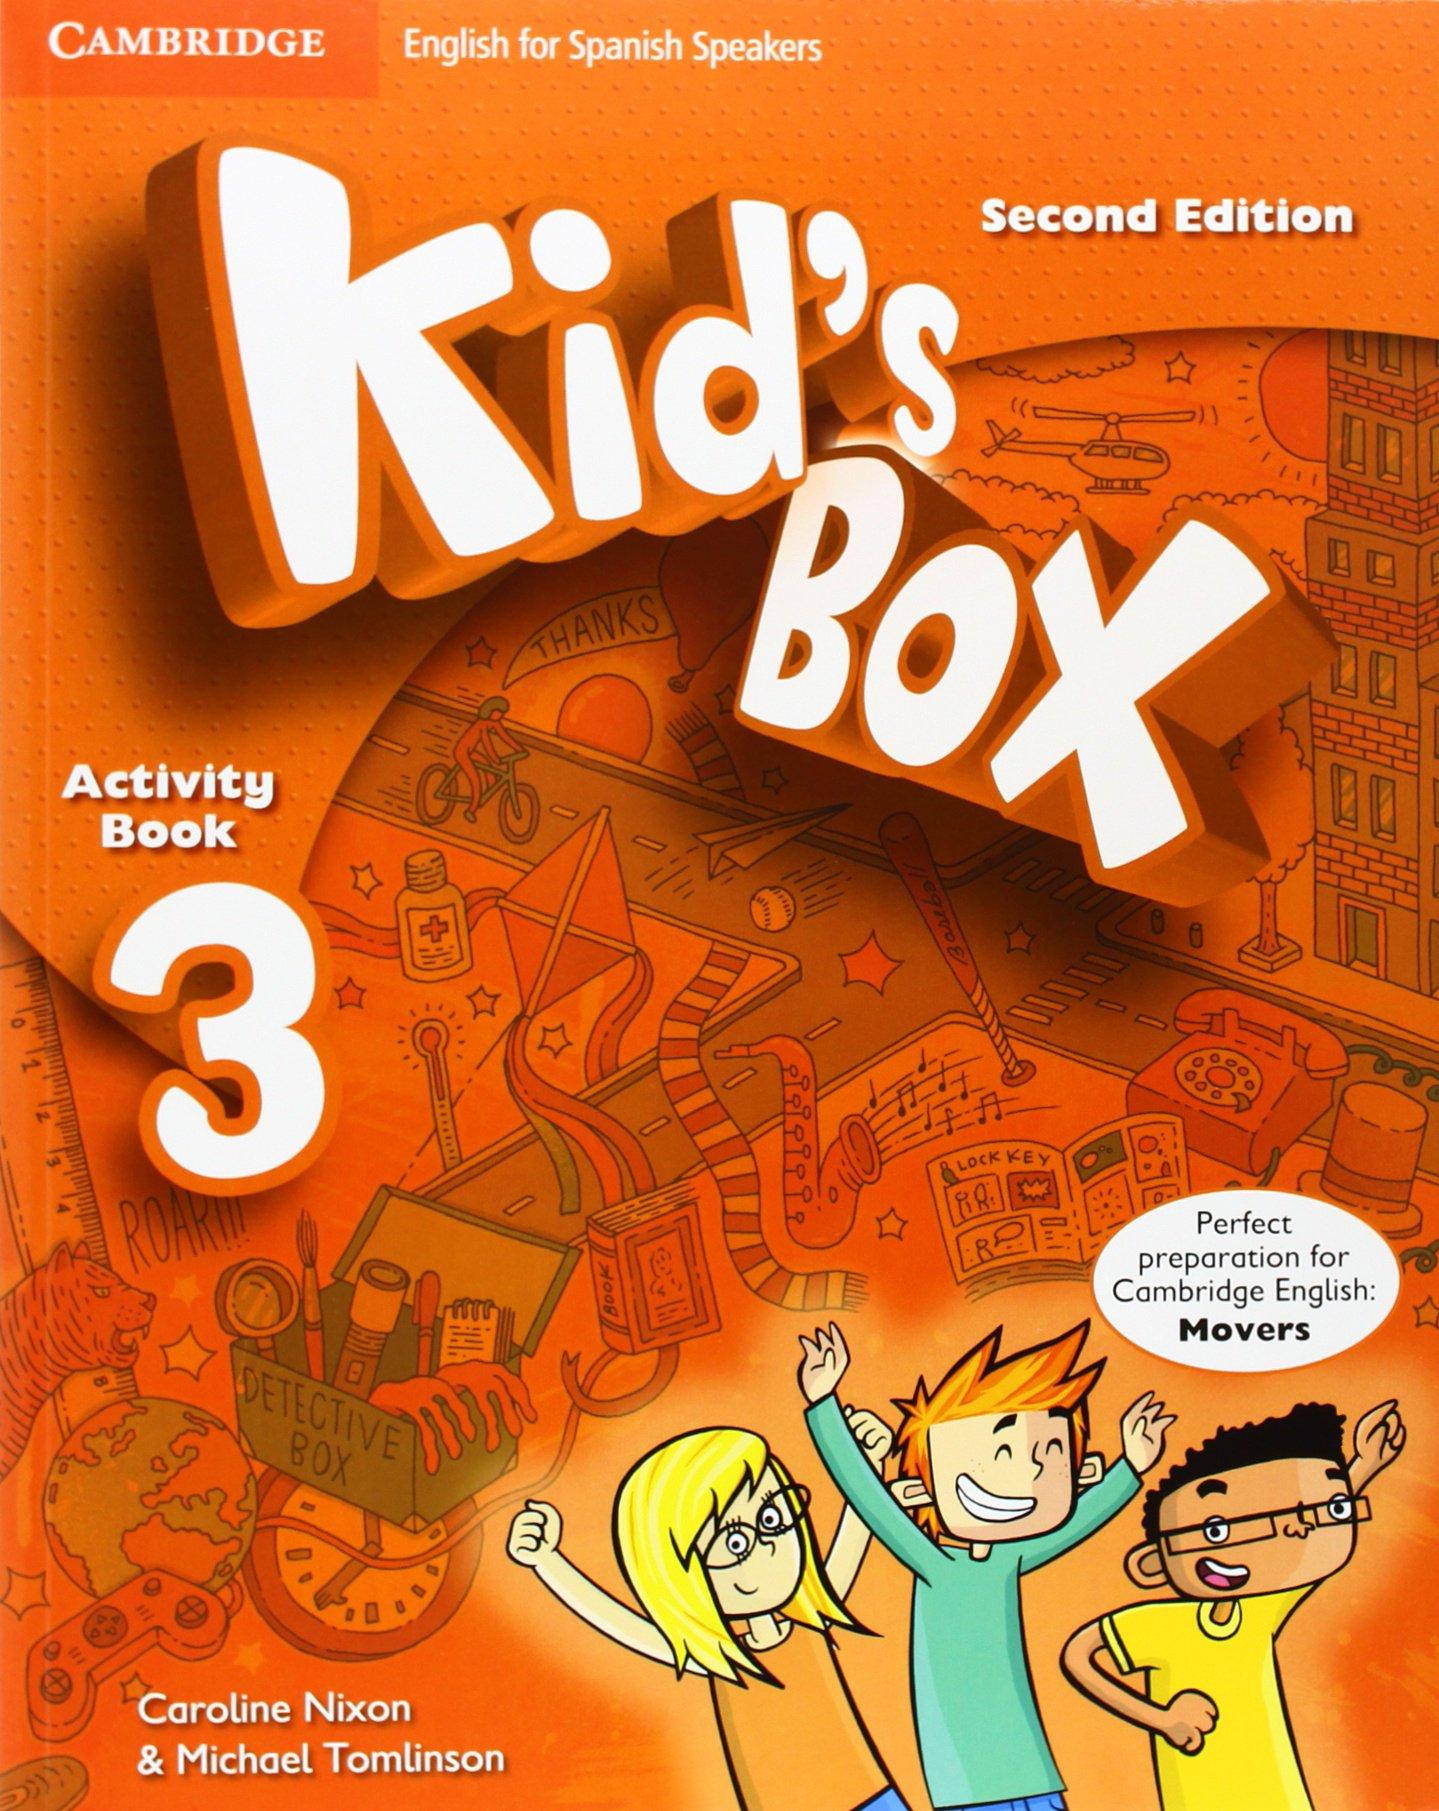 KIDS BOX 3 WORKBOOK 2014 CAMBRID Paperback – 2014